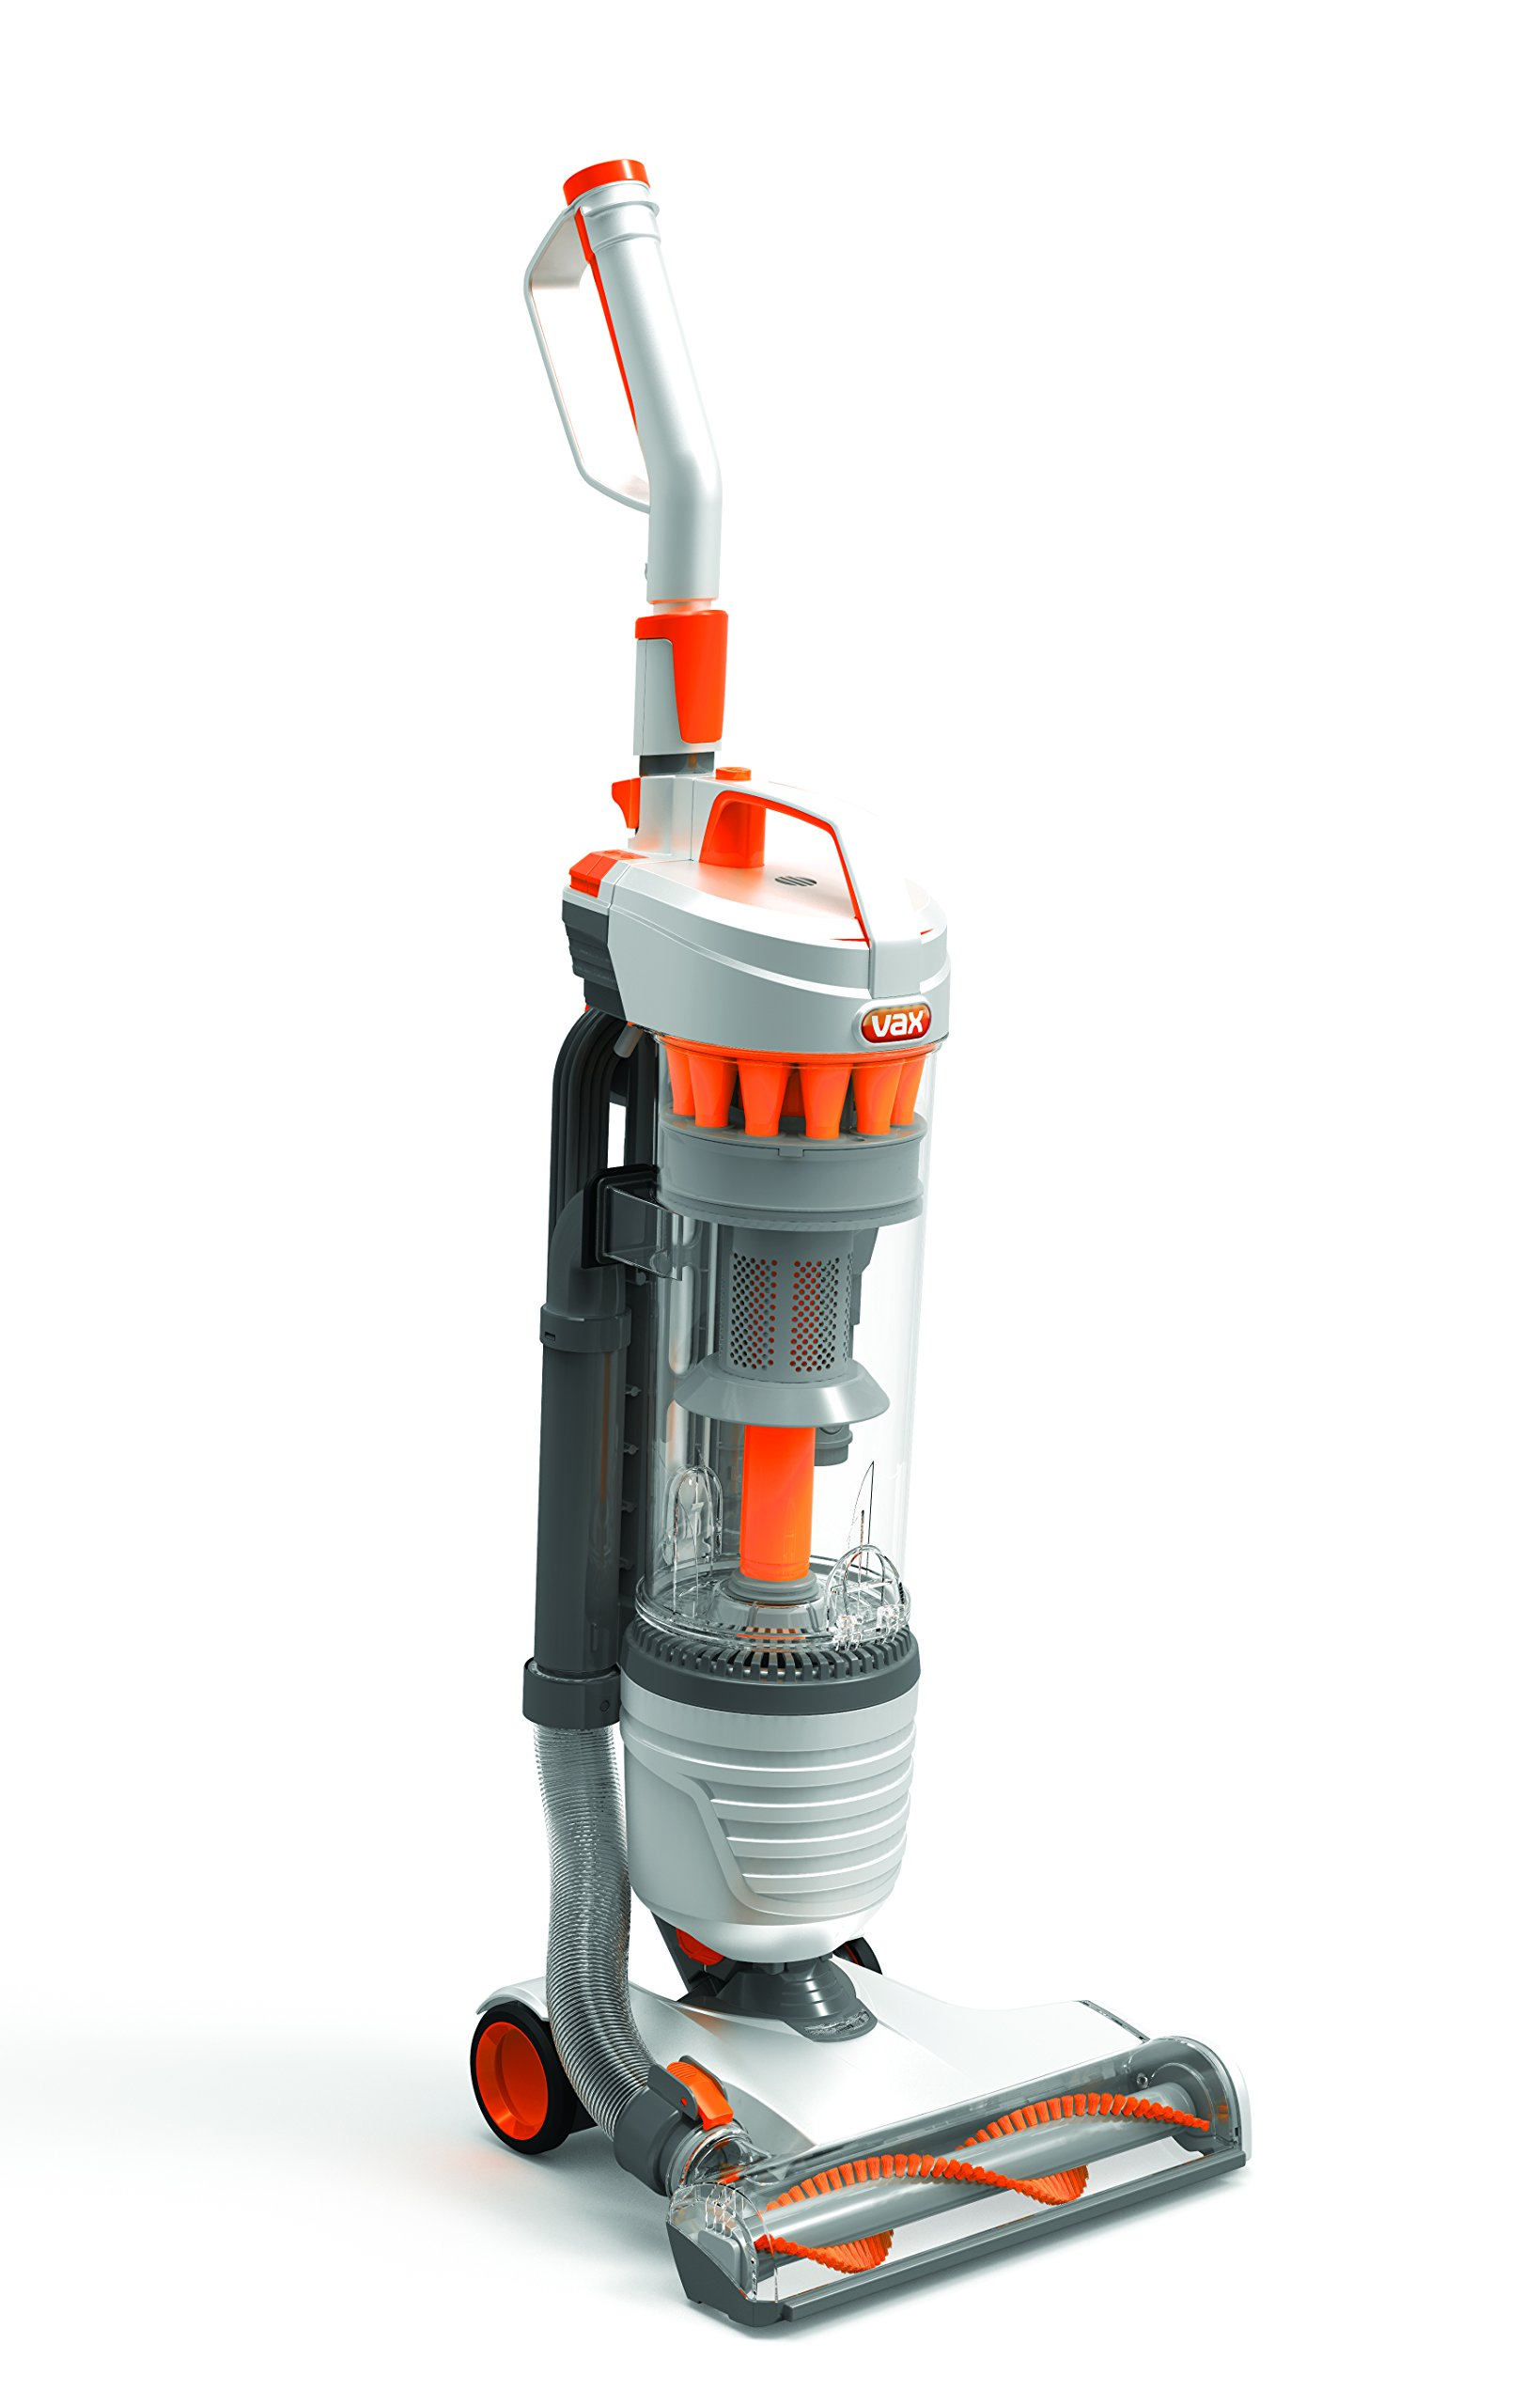 Vax Air Base U88-AM-Be Bagless Upright Vacuum